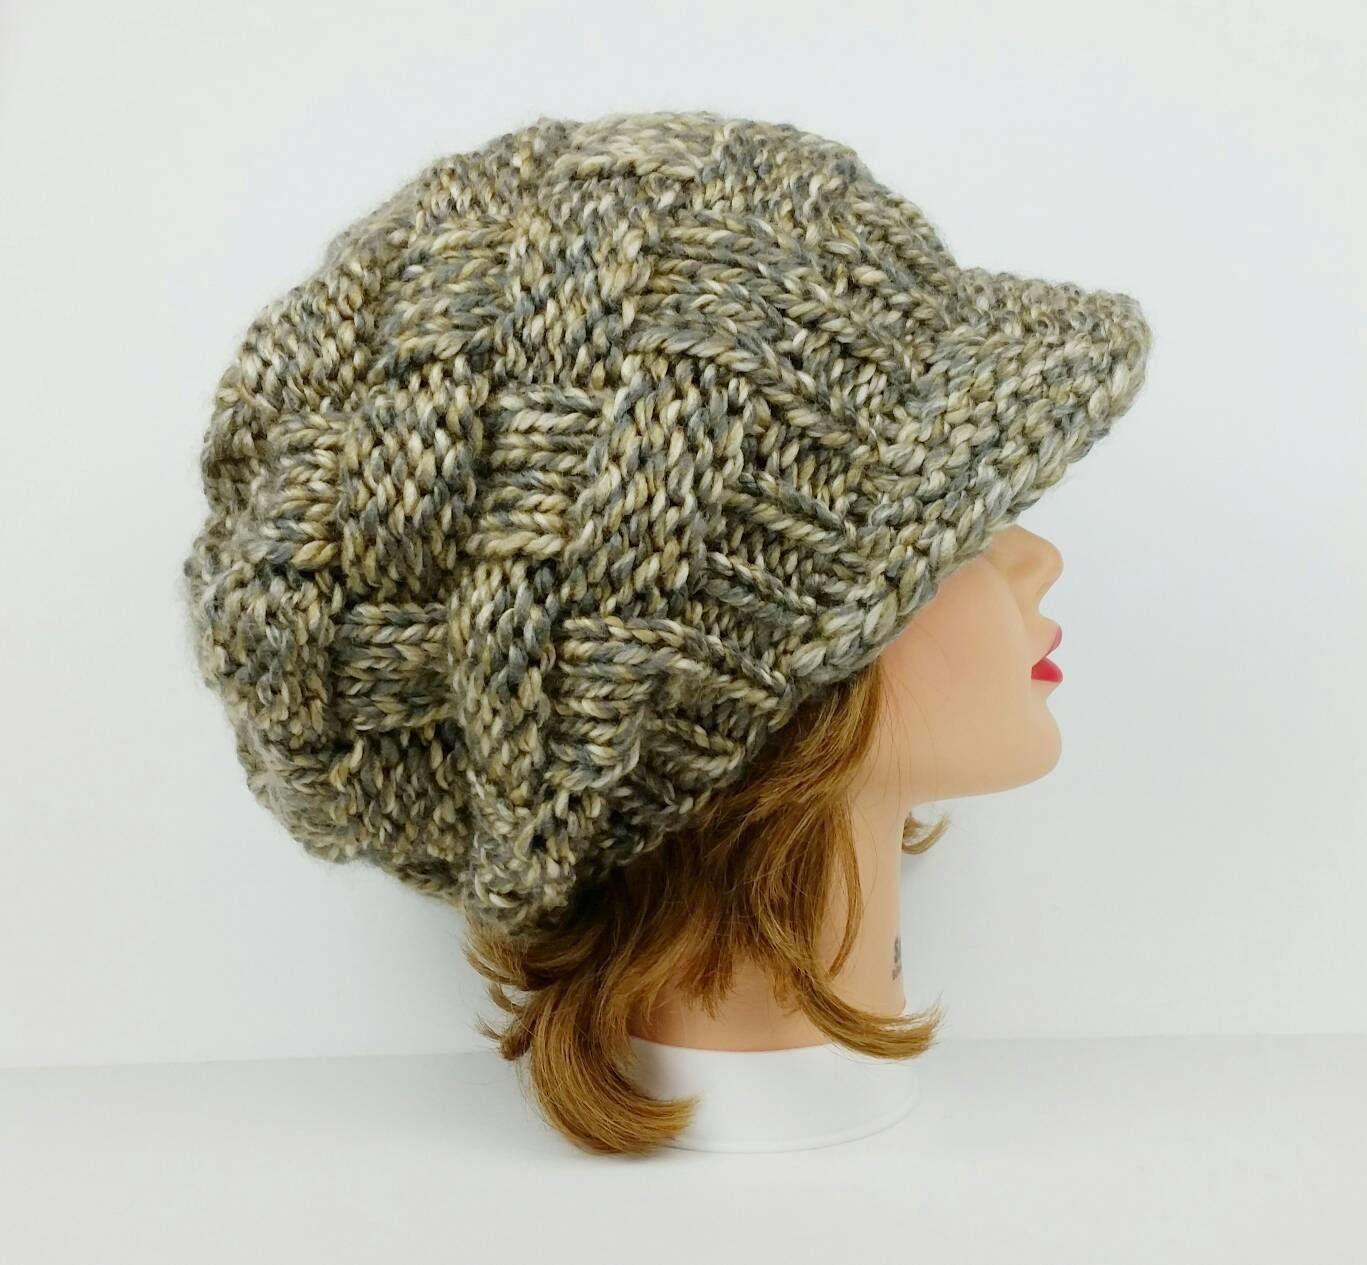 Knit Newsboy Hat Visor Beanie Chunky Knit Hat Women Visor Etsy Crochet Newsboy Hat Visor Beanie Chunky Knit Hat